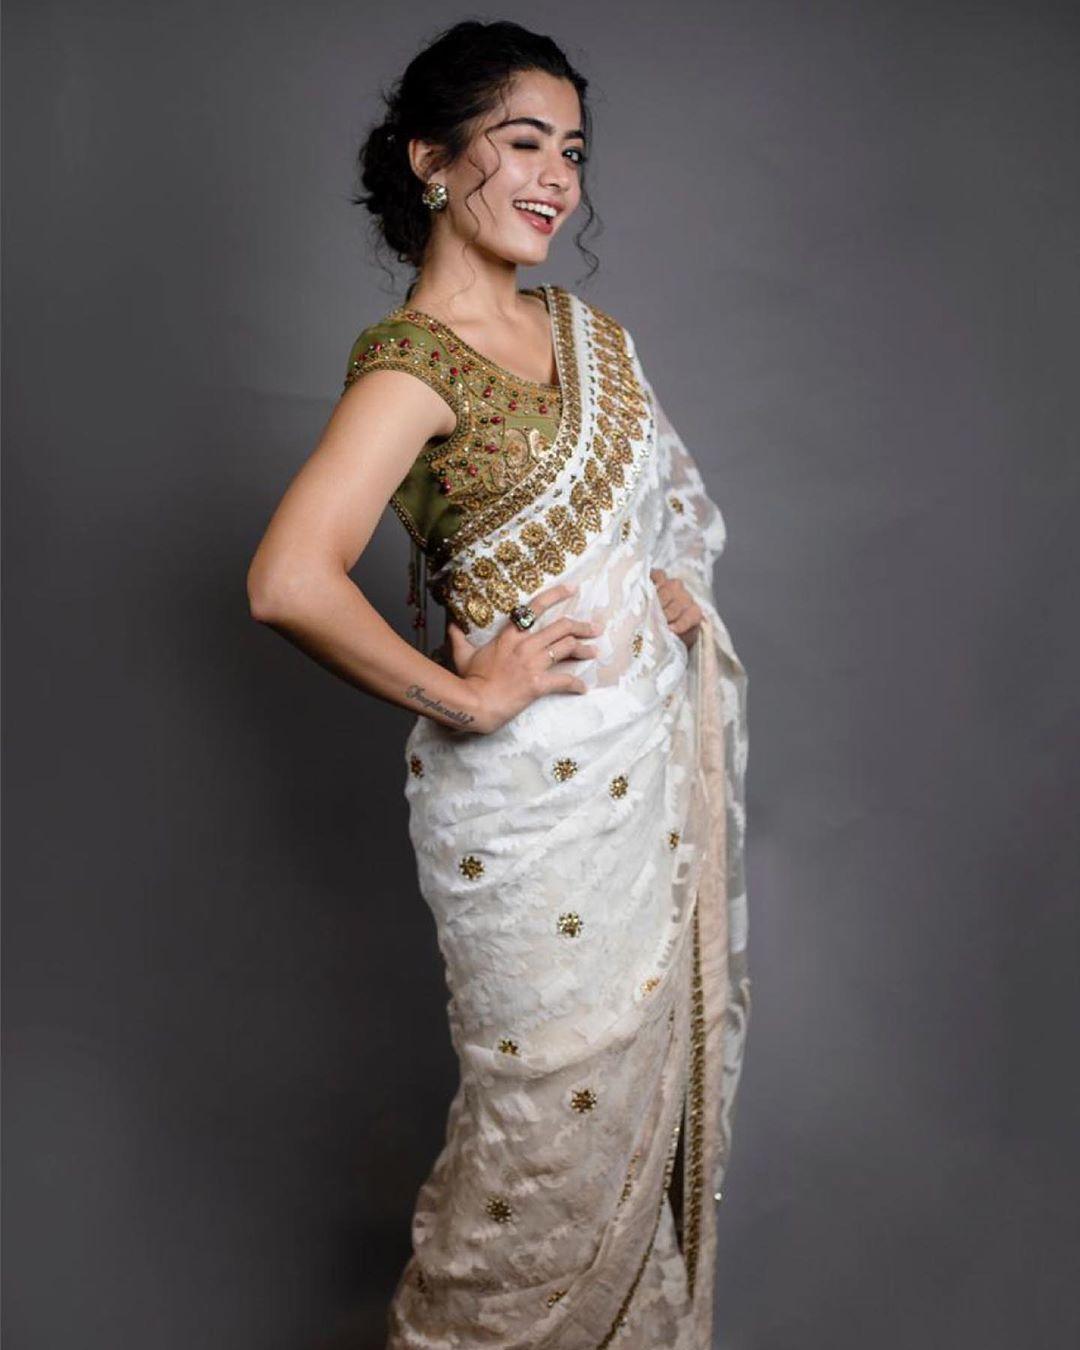 Rashmika Mandanna New Latest Hd Photos Sarileru Neekevvaru Bheeshma Movie Heroine Actress Rashmika Mandanna Photo Shoot Images 25cineframes